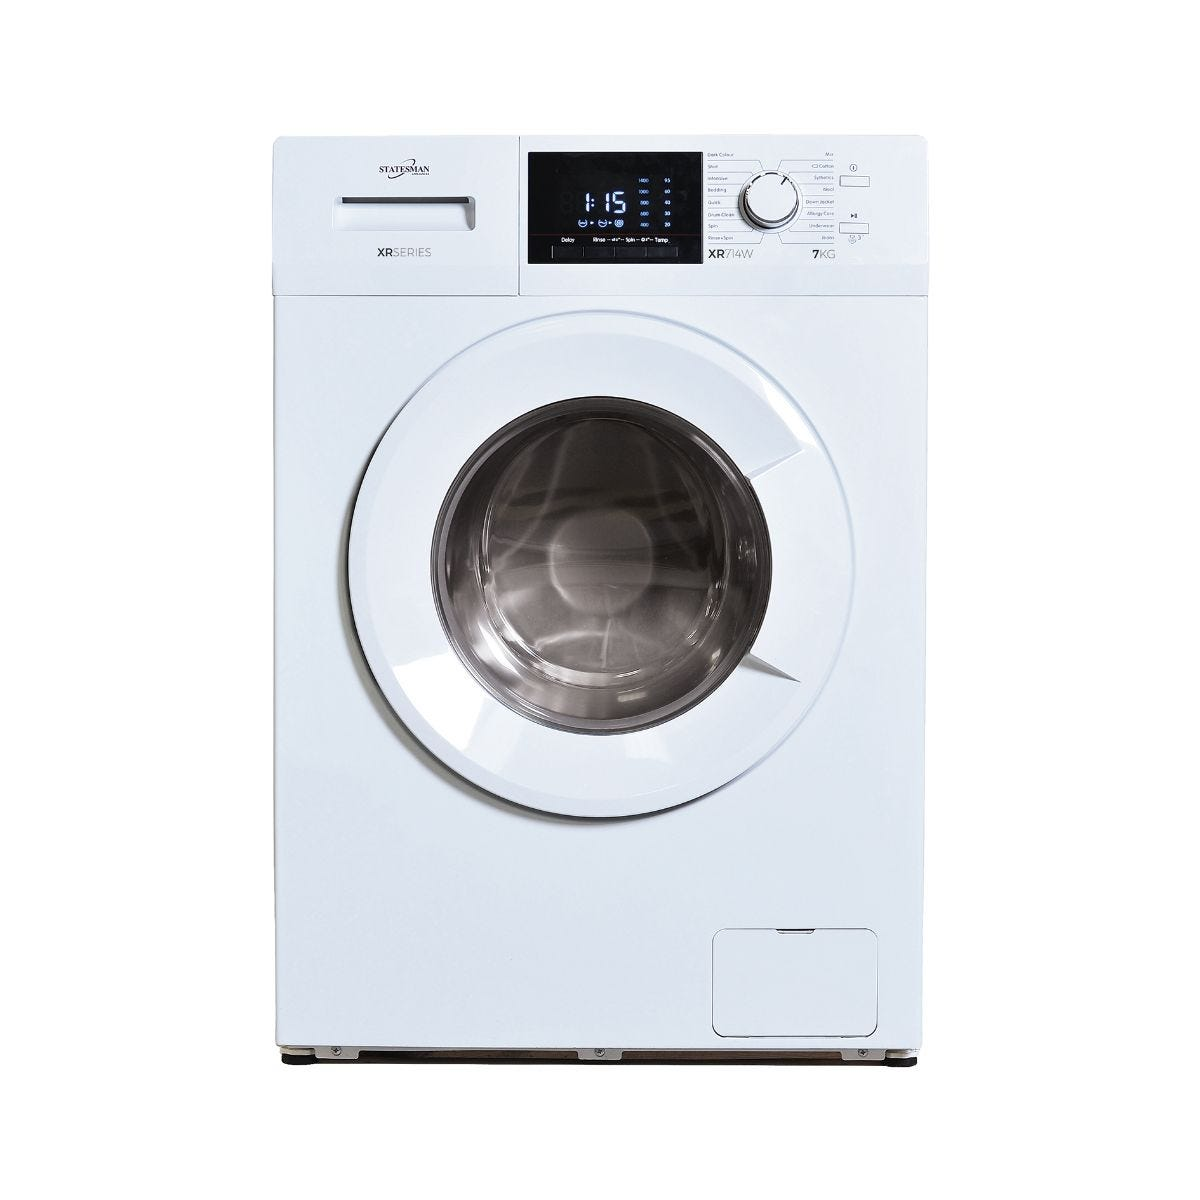 Statesman Washing Machine White 7KG Load, WHITE